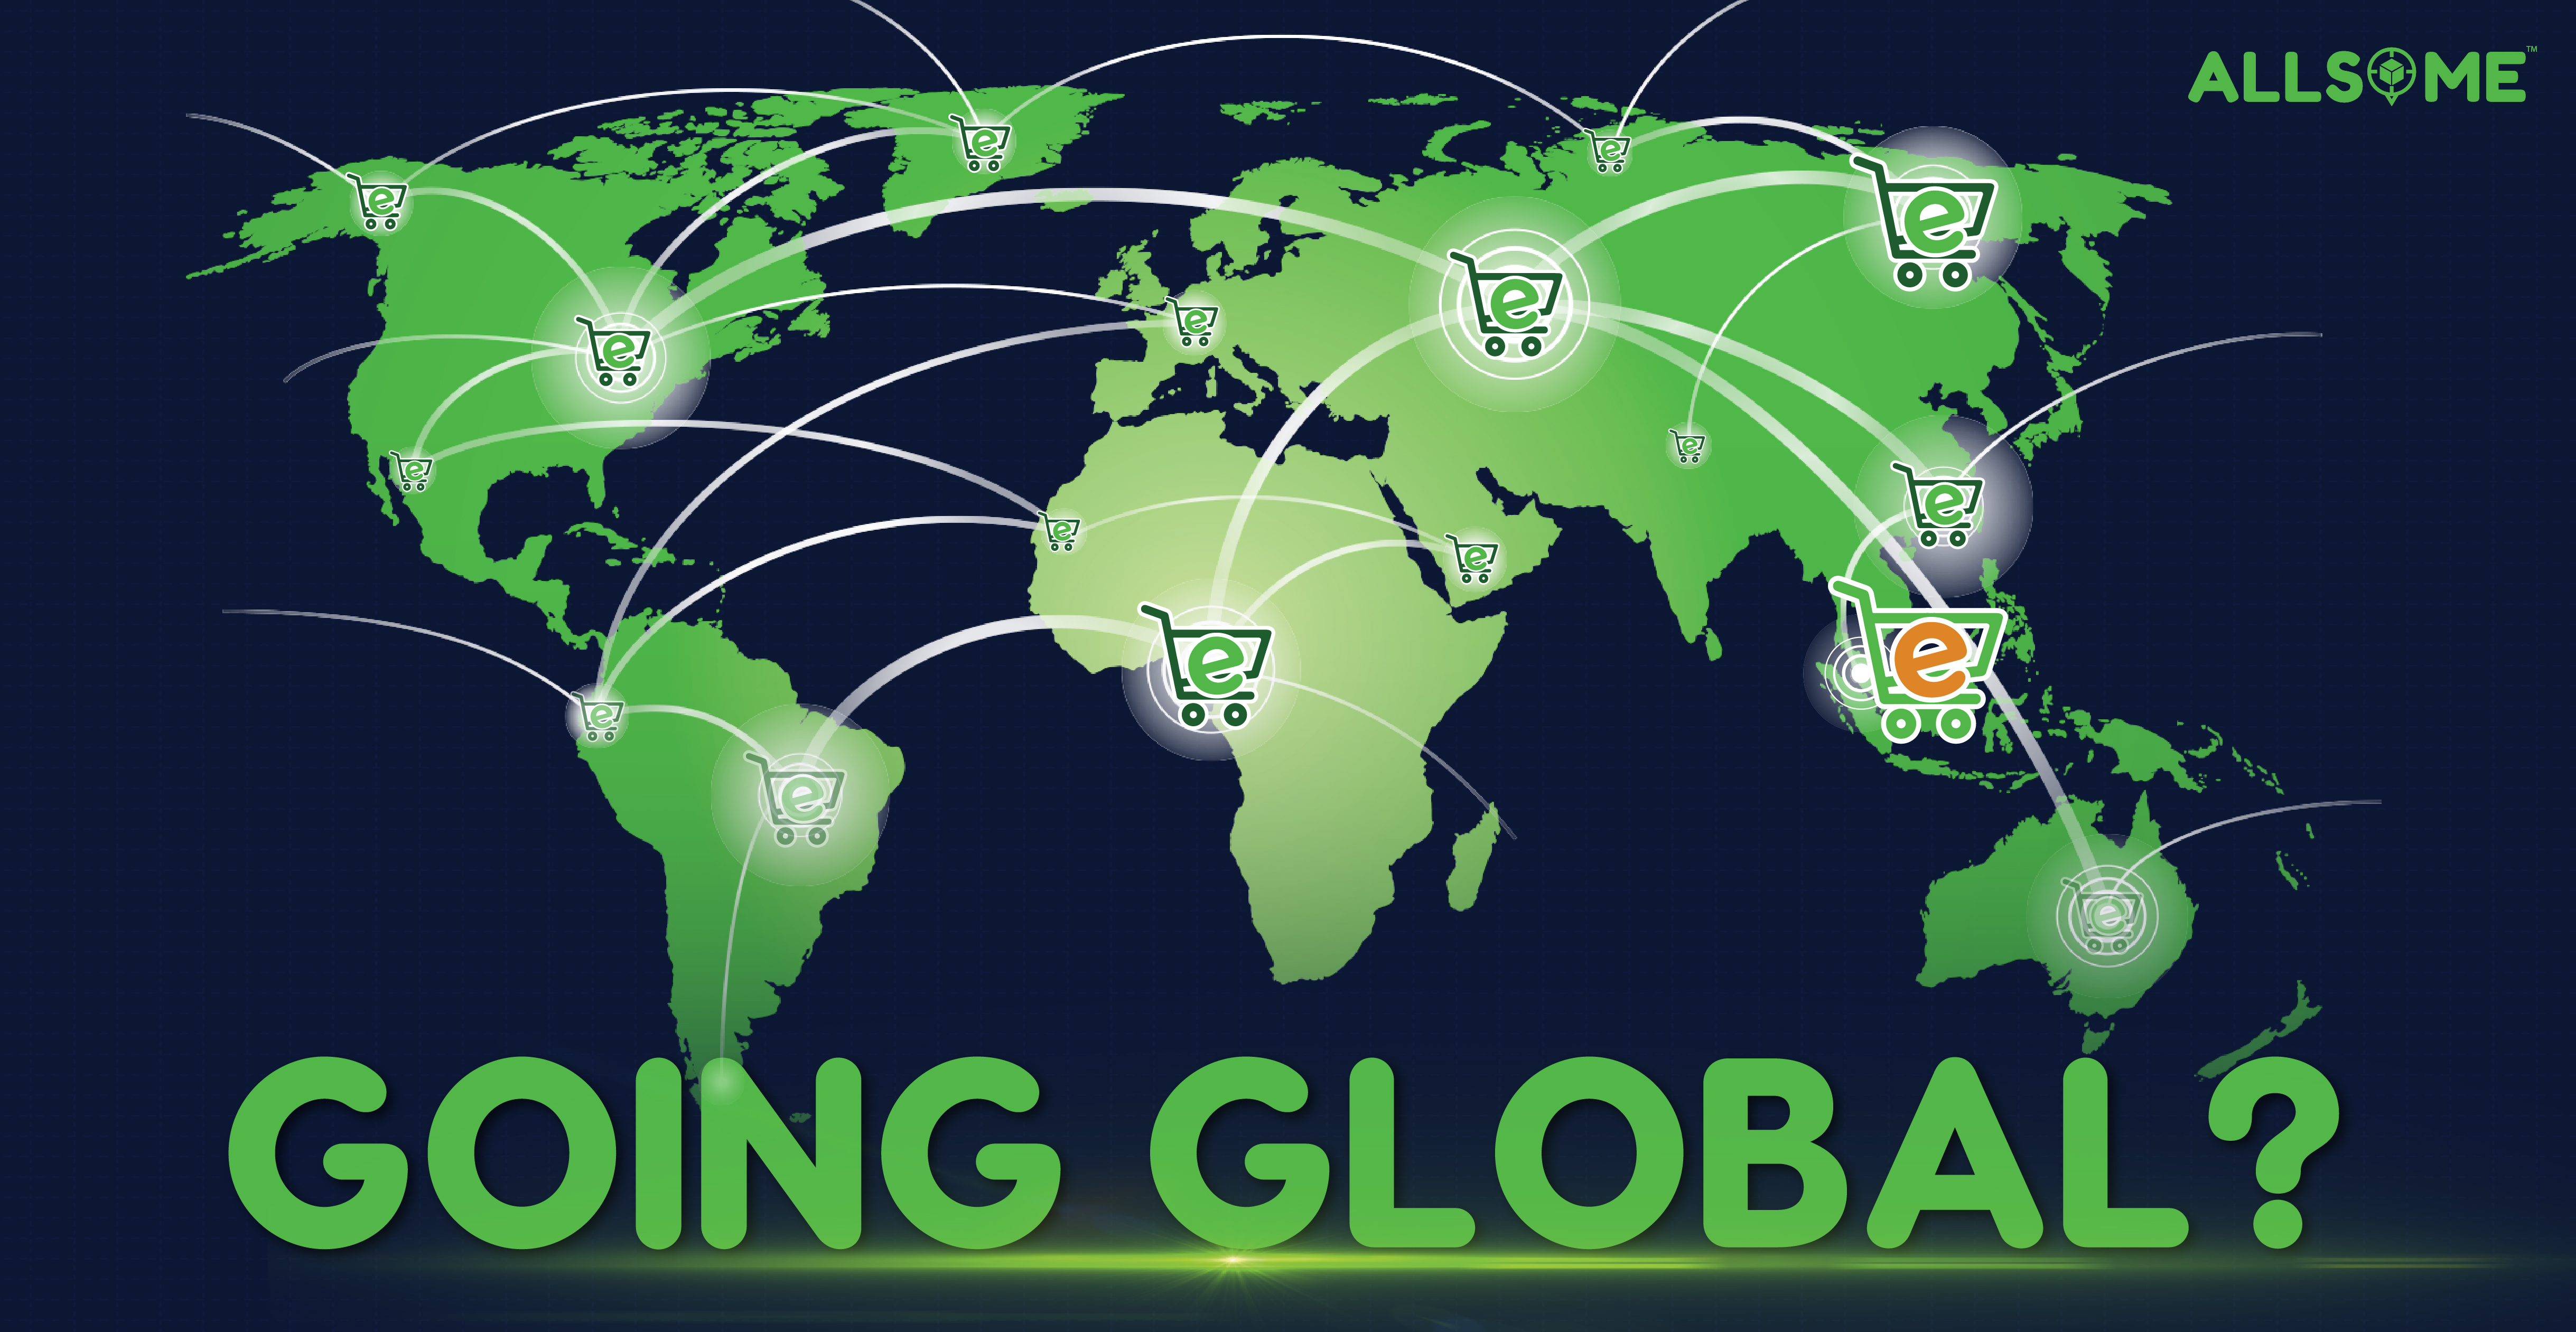 AllSome_GoingGlobal-01